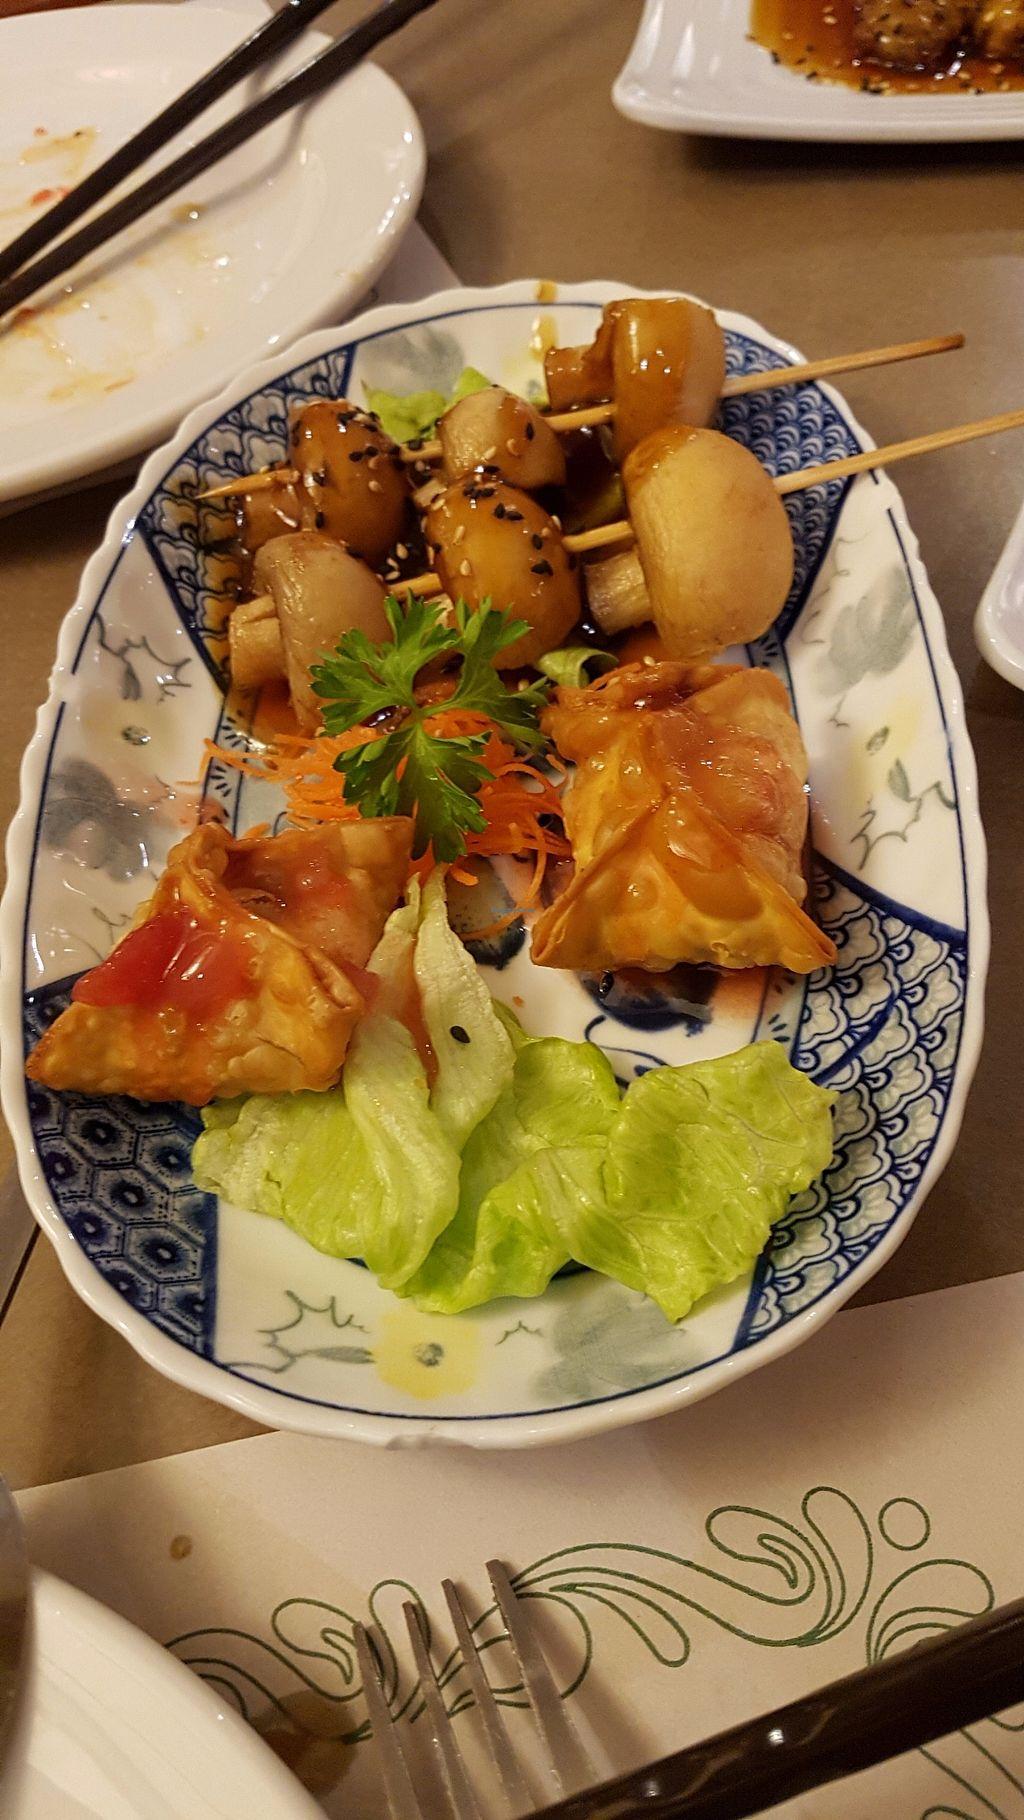 "Photo of Yuan Vegetarien  by <a href=""/members/profile/JonJon"">JonJon</a> <br/>Mushroom skewers and samossas <br/> July 28, 2017  - <a href='/contact/abuse/image/4918/285867'>Report</a>"